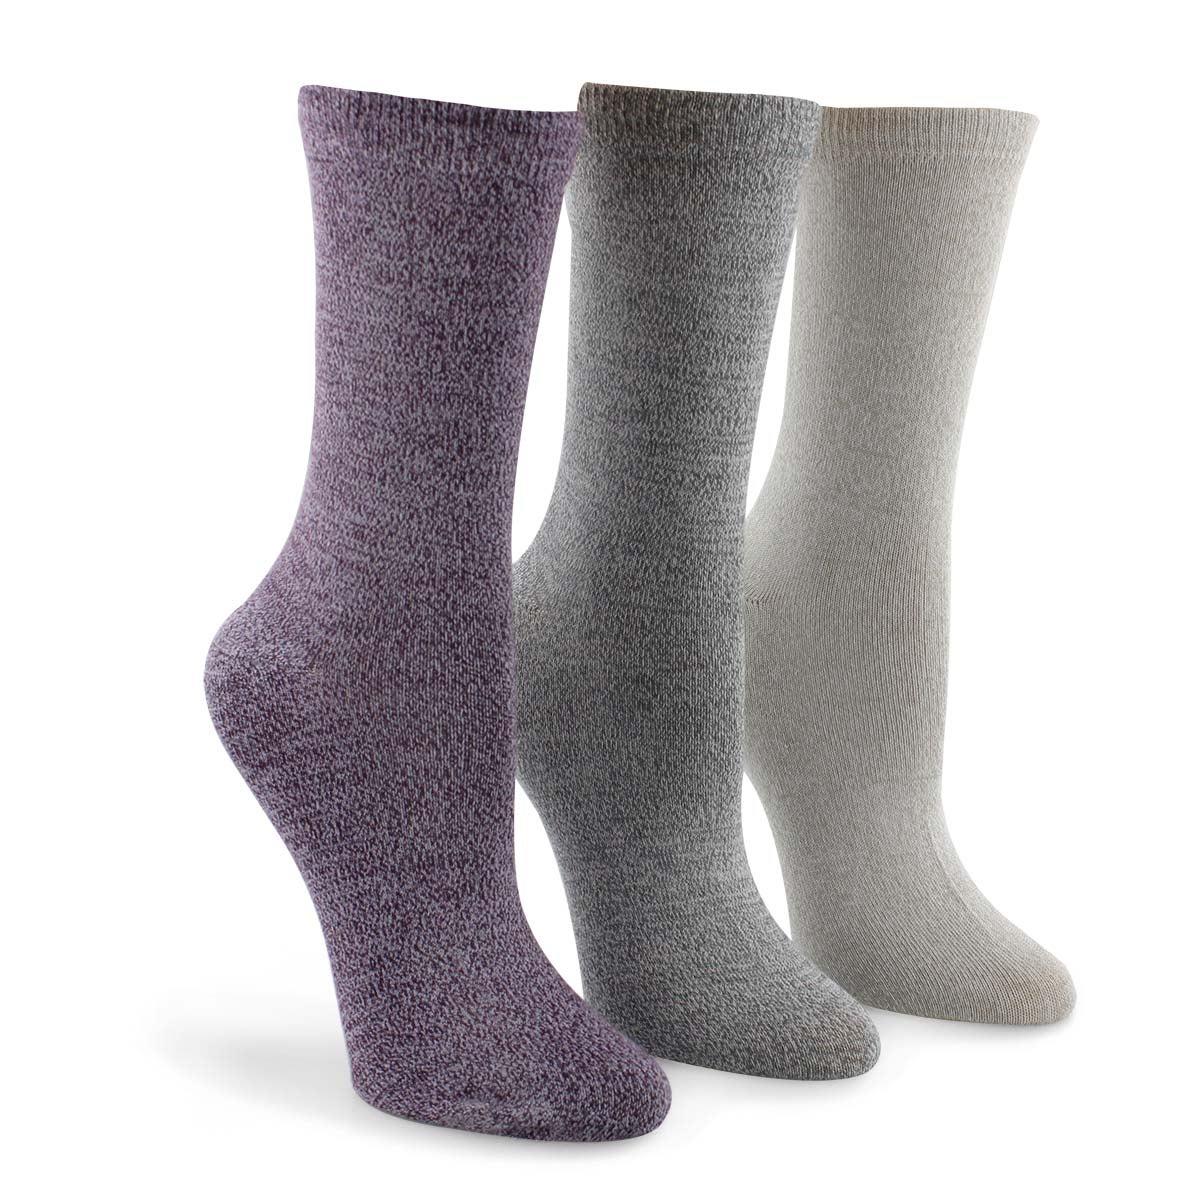 Women's Marled Crew Sock - Multi Coloured  3pk